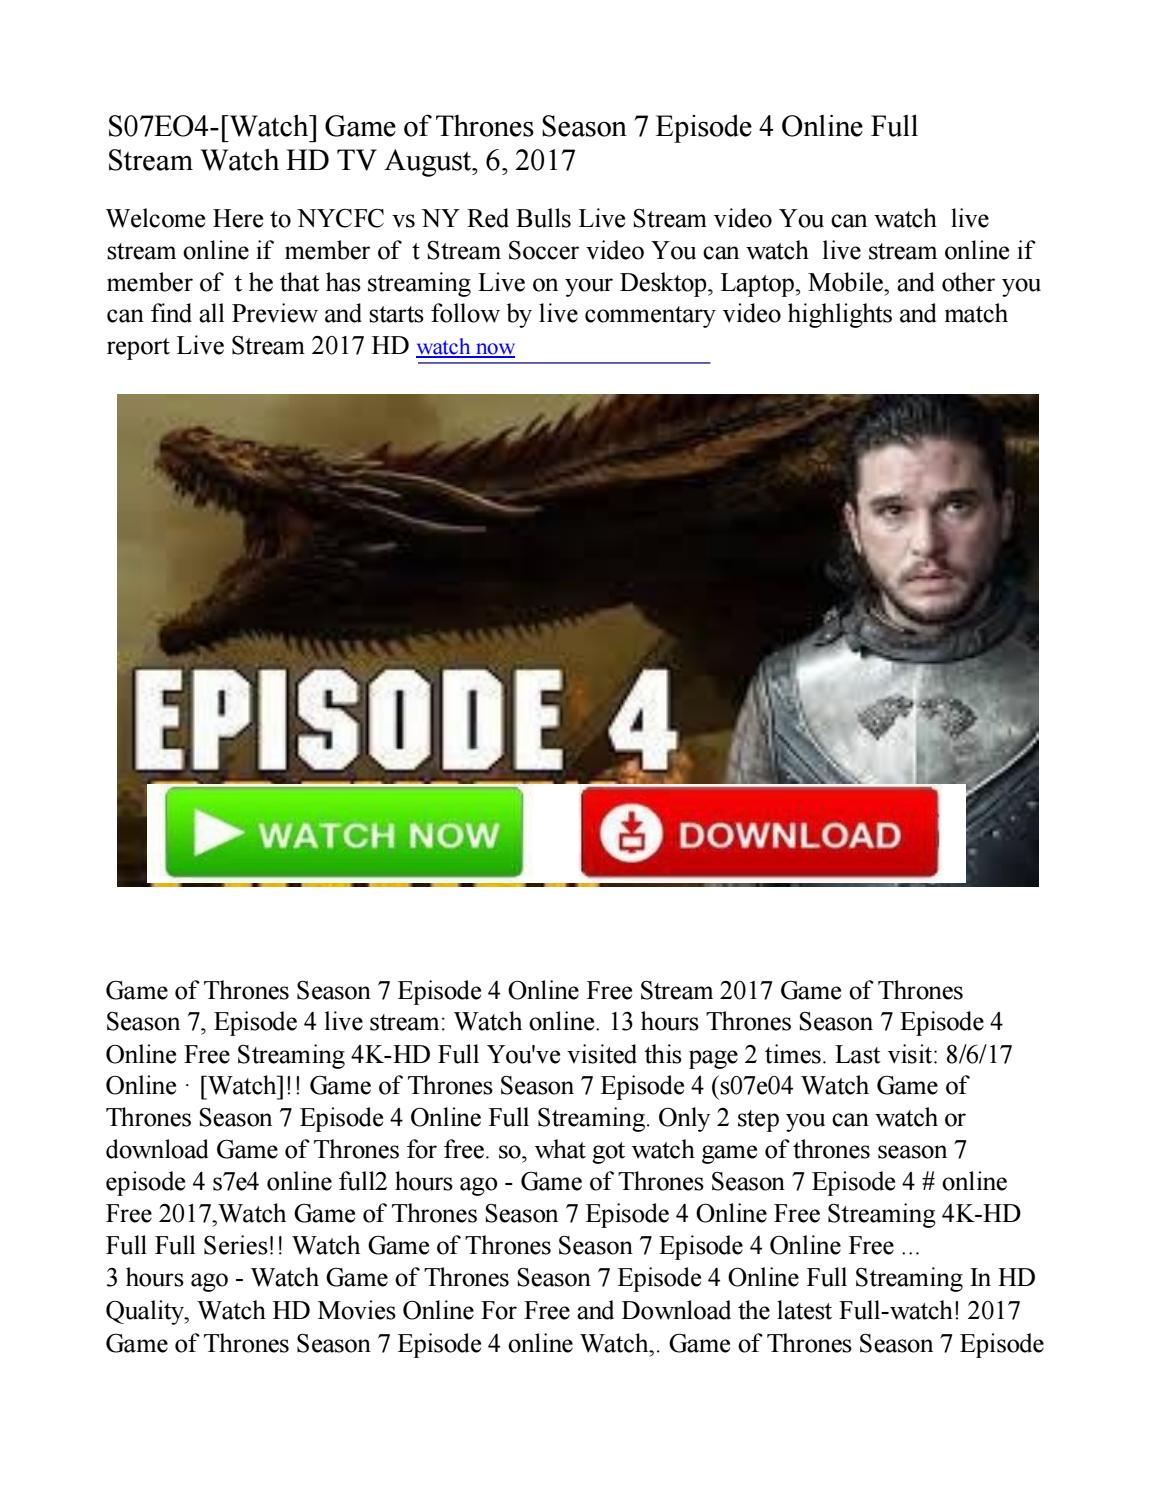 $$+STREAM-S07E04!!!watch Game of Thrones Season 7 Episode 4 Online HBO TV by Sheila Karasan - Issuu